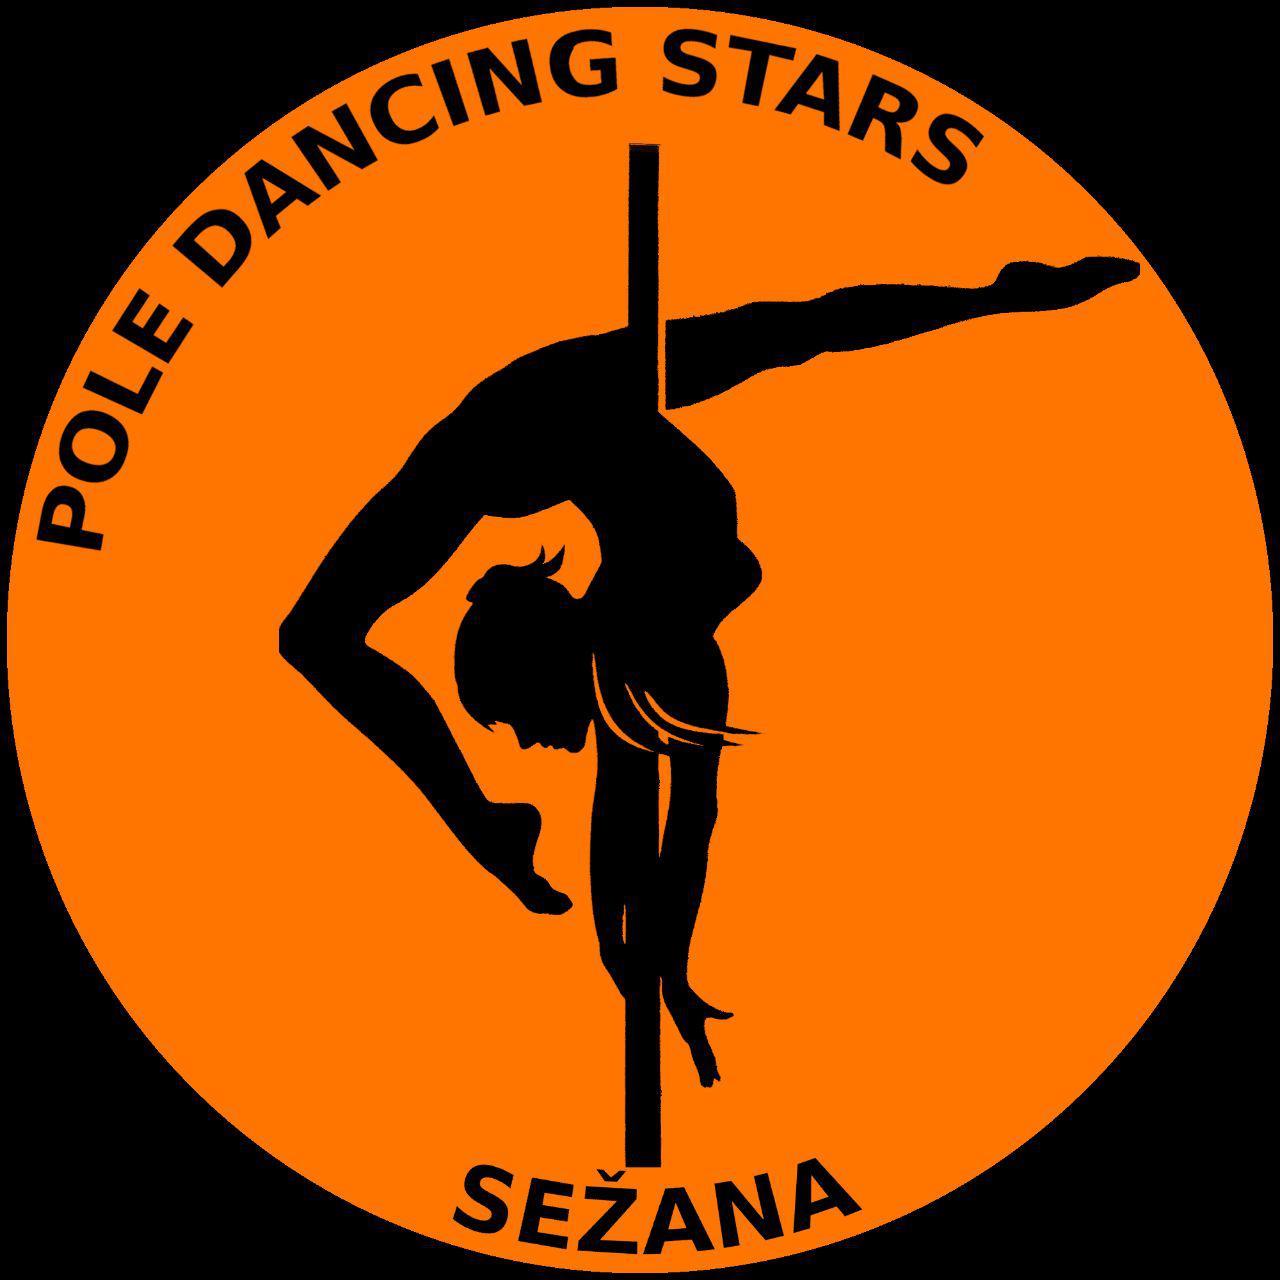 Pole Dancing Stars Sežana